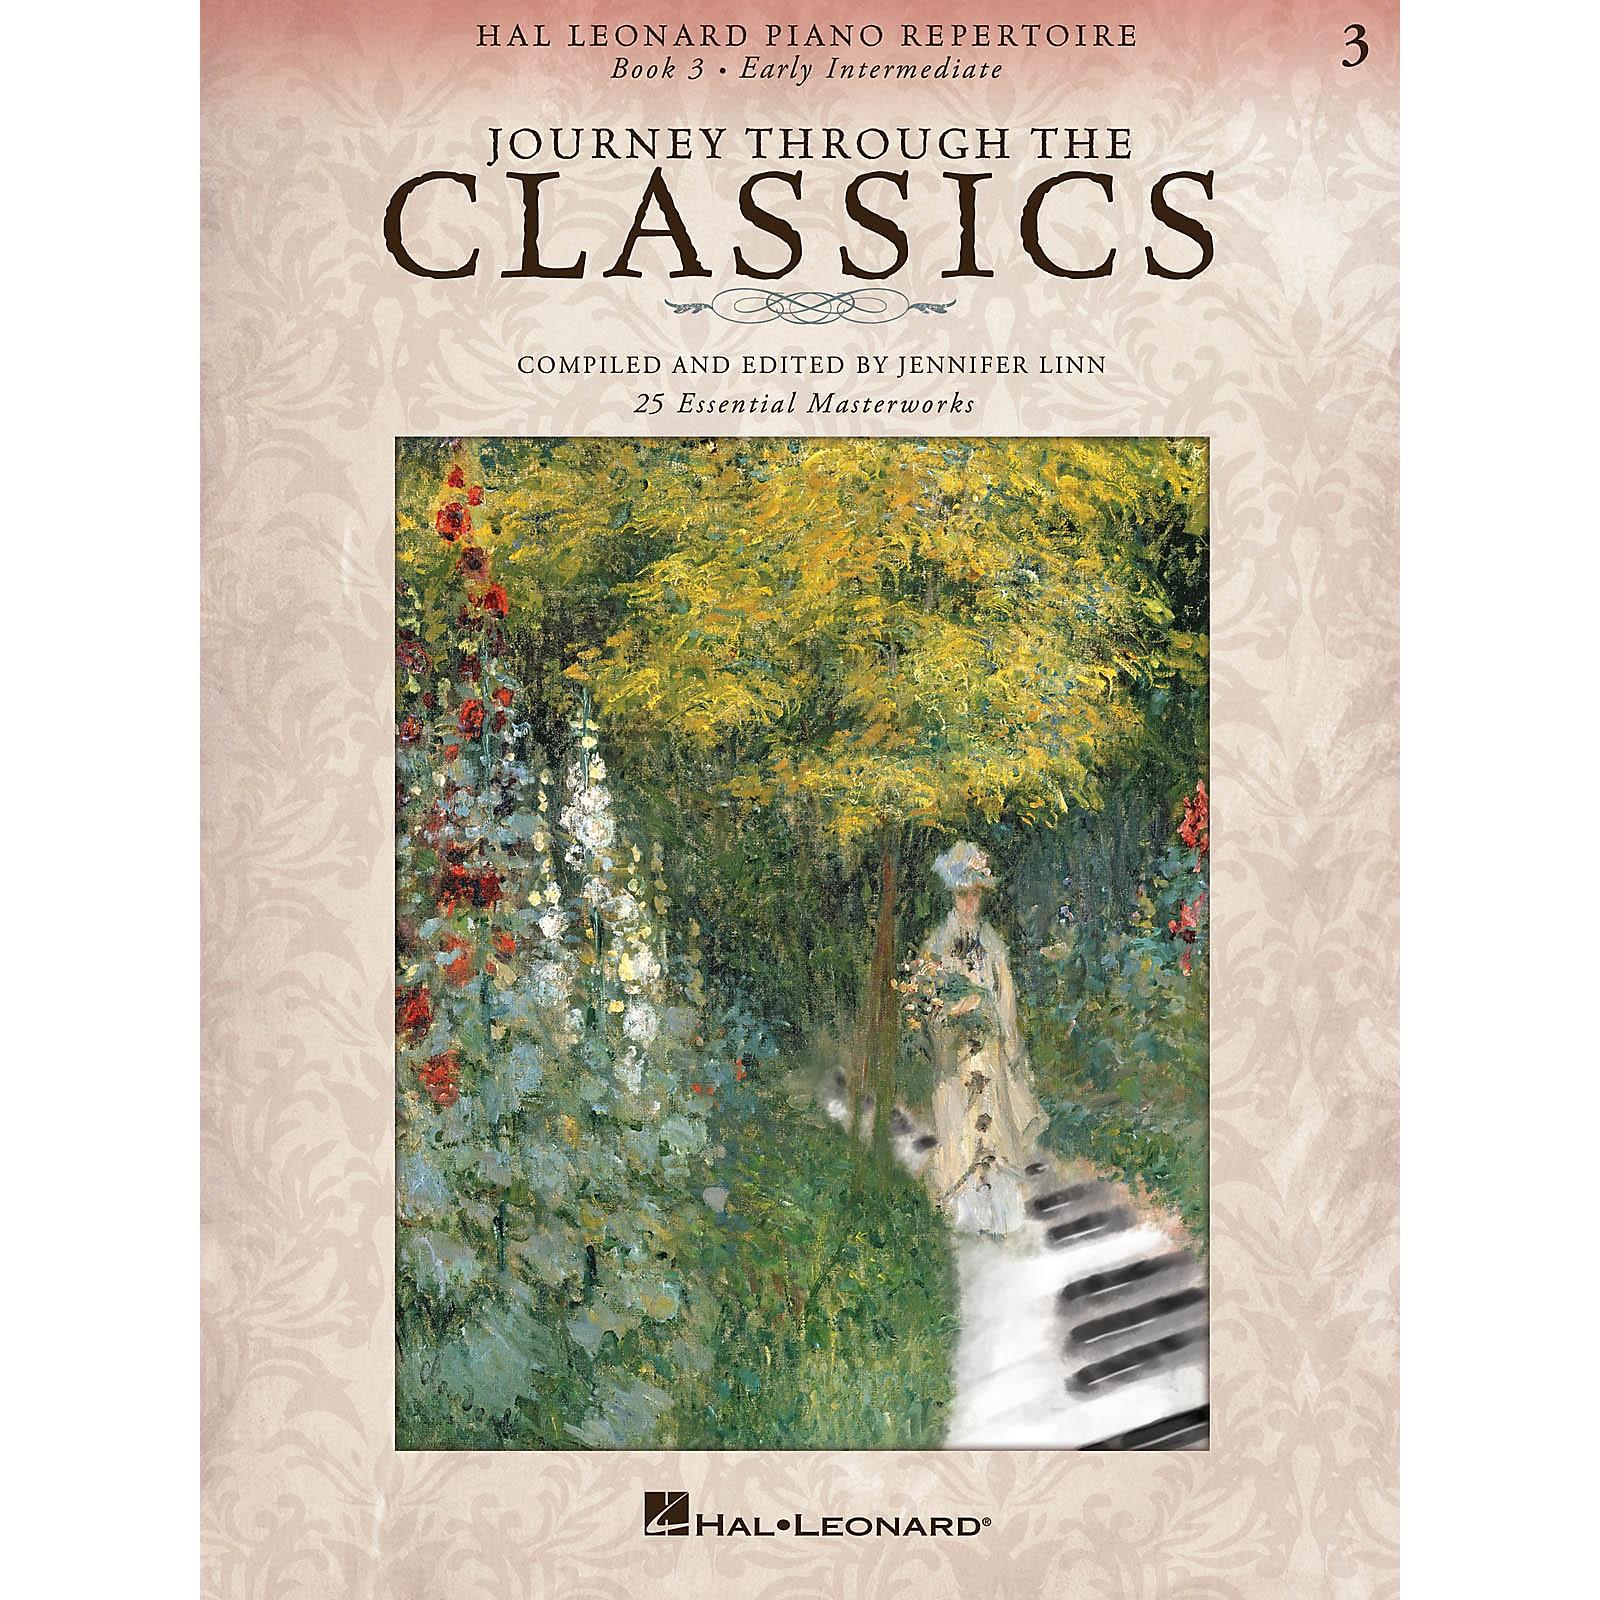 Hal Leonard Piano Repertoire Series - Journey Through The Classics Book 3 Early Intermediate